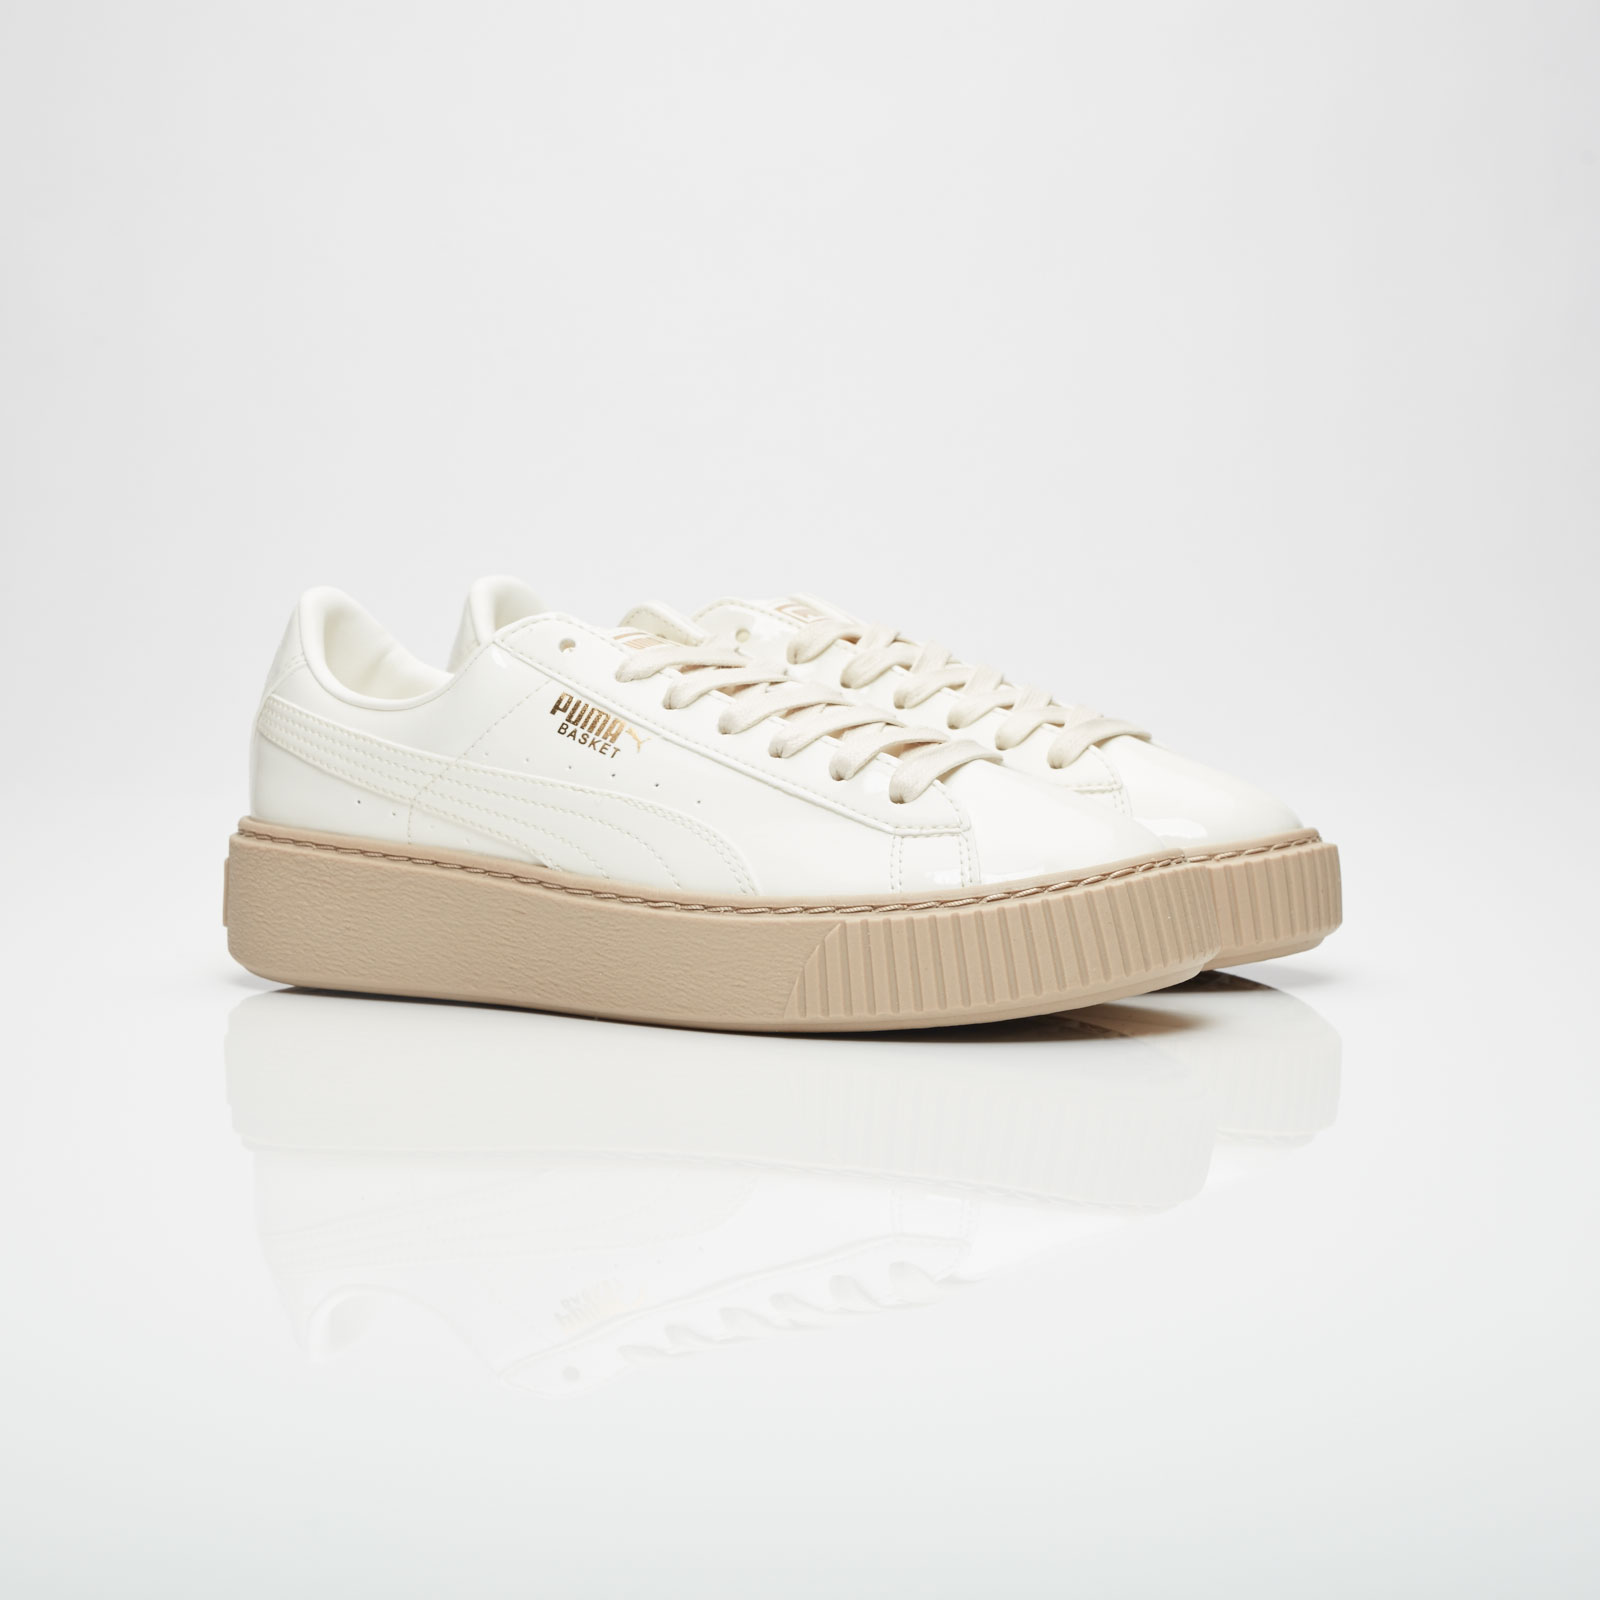 Puma Platform Patent Wns - 363314-05 - Sneakersnstuff  9c62420e9